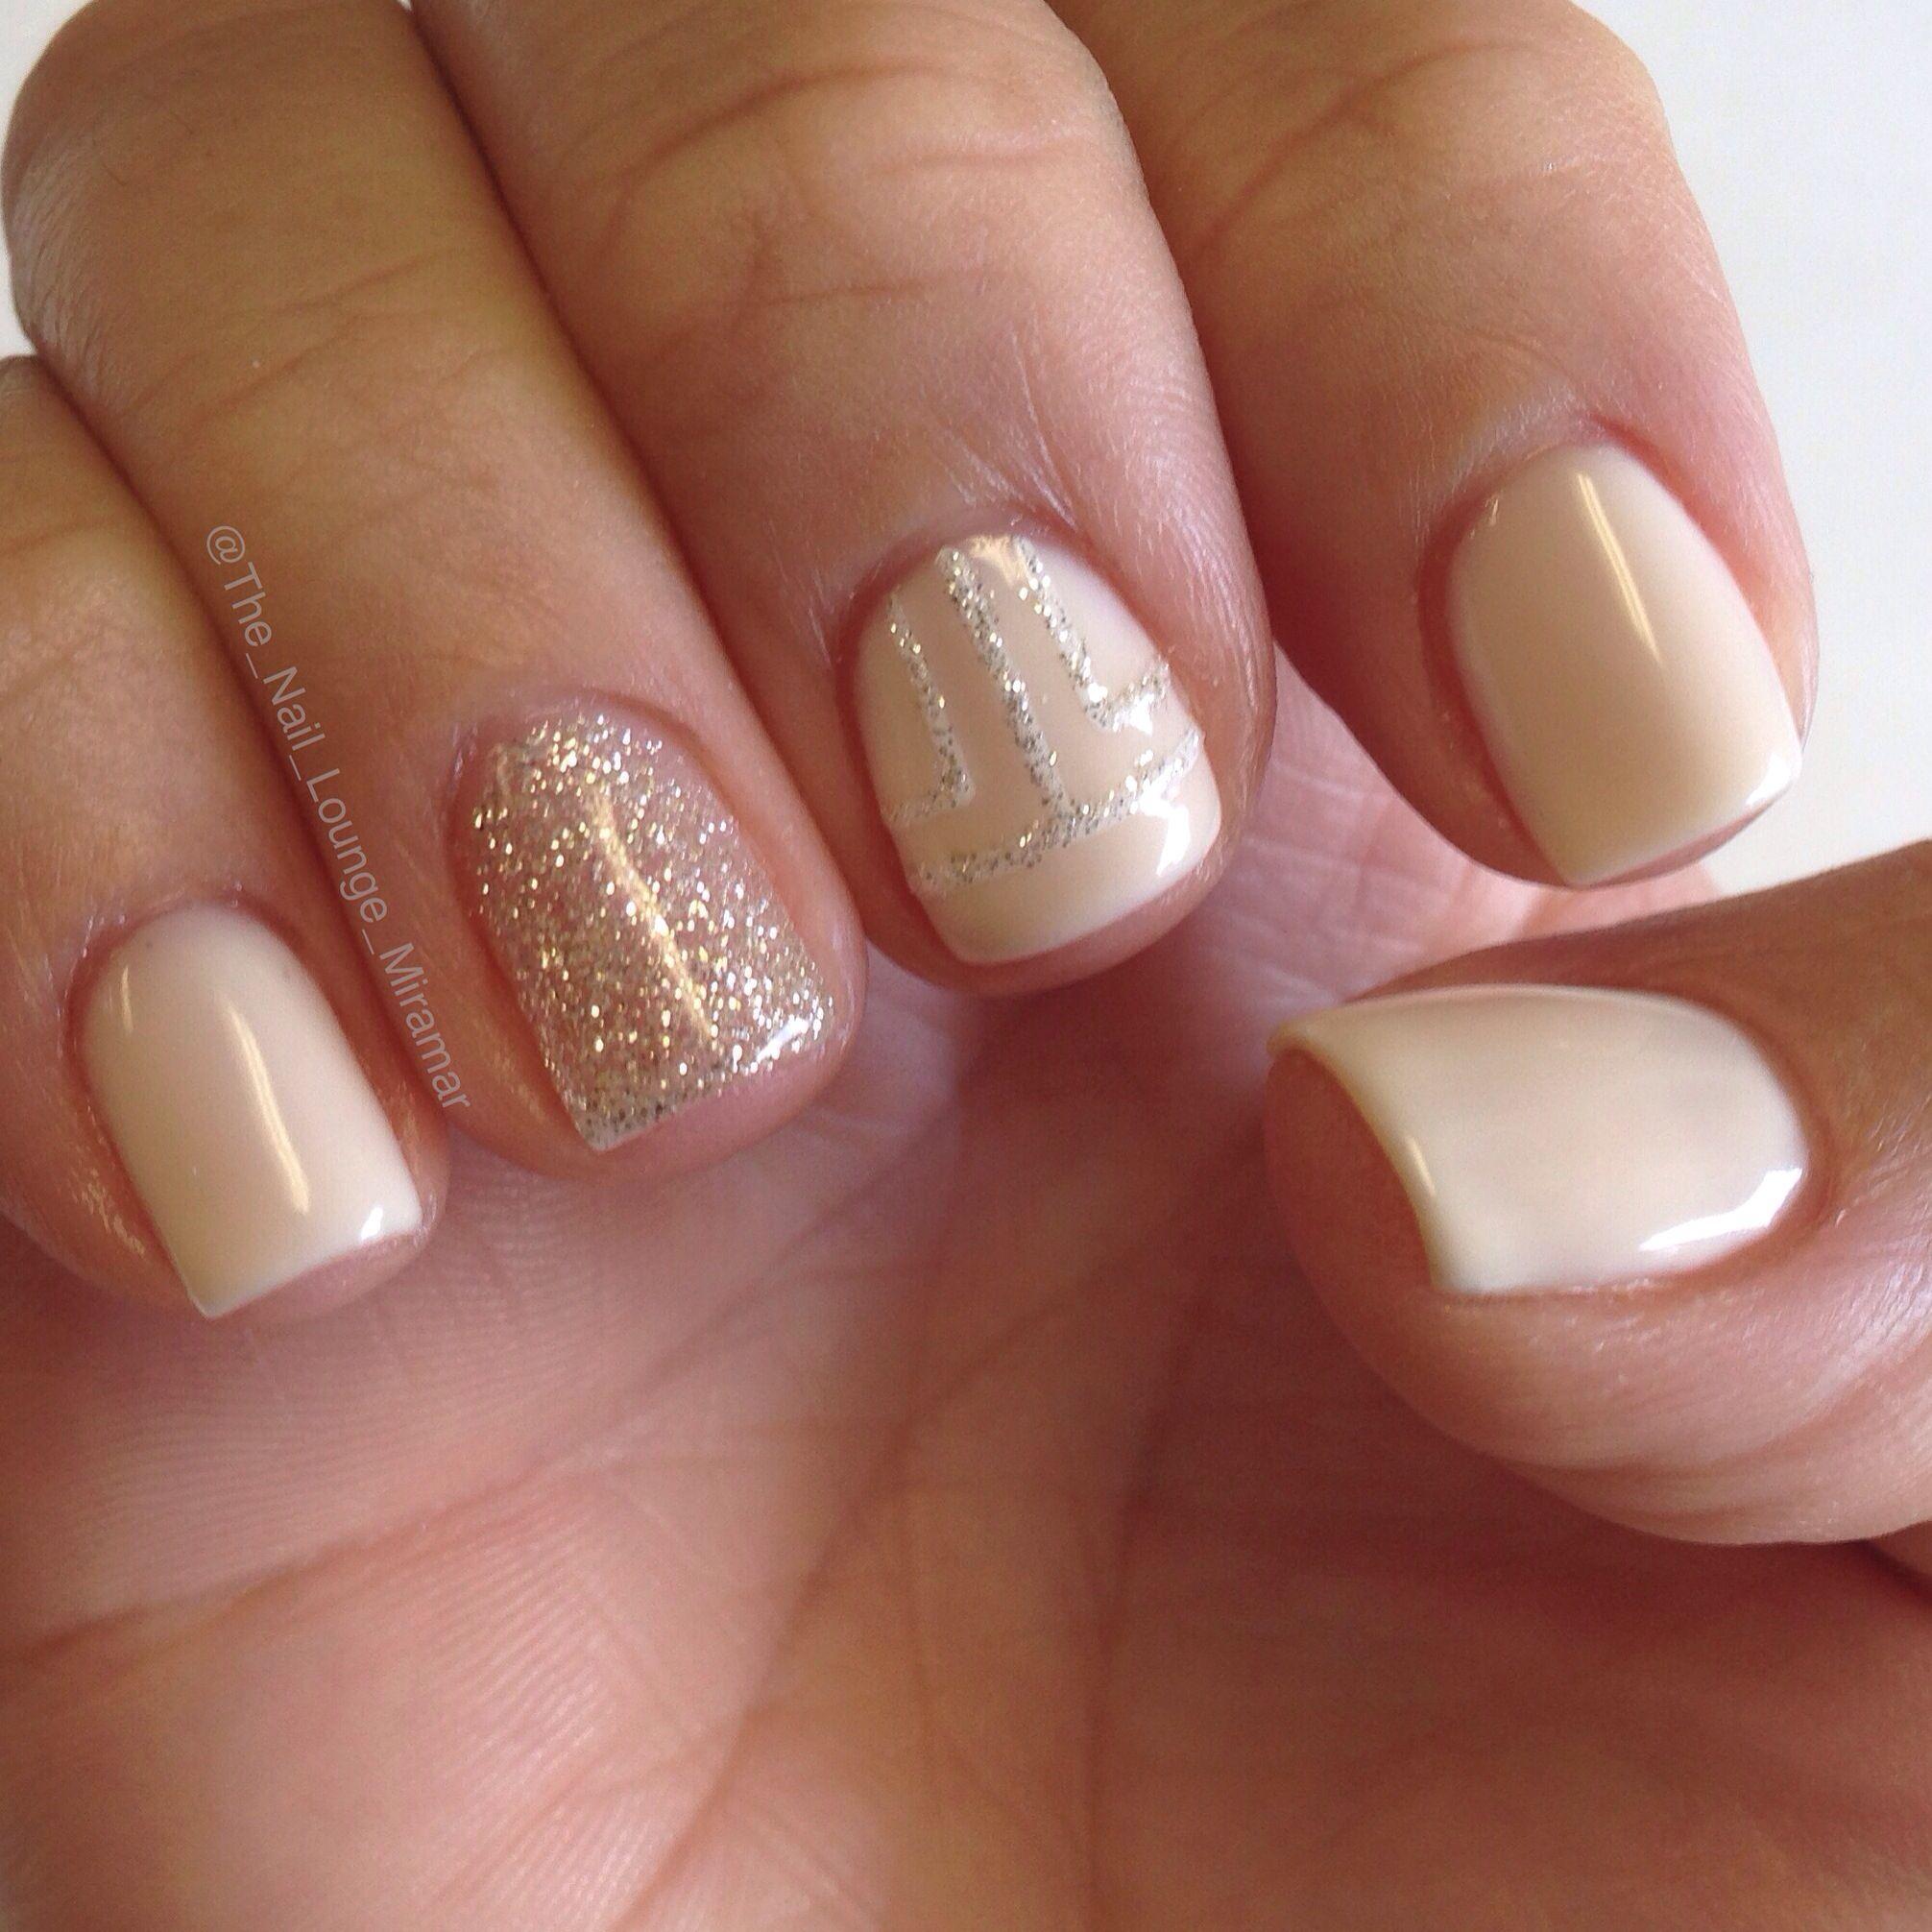 Simple Gel Nail Art Designs: Simple Nude & Glitter Gel Nail Art Design